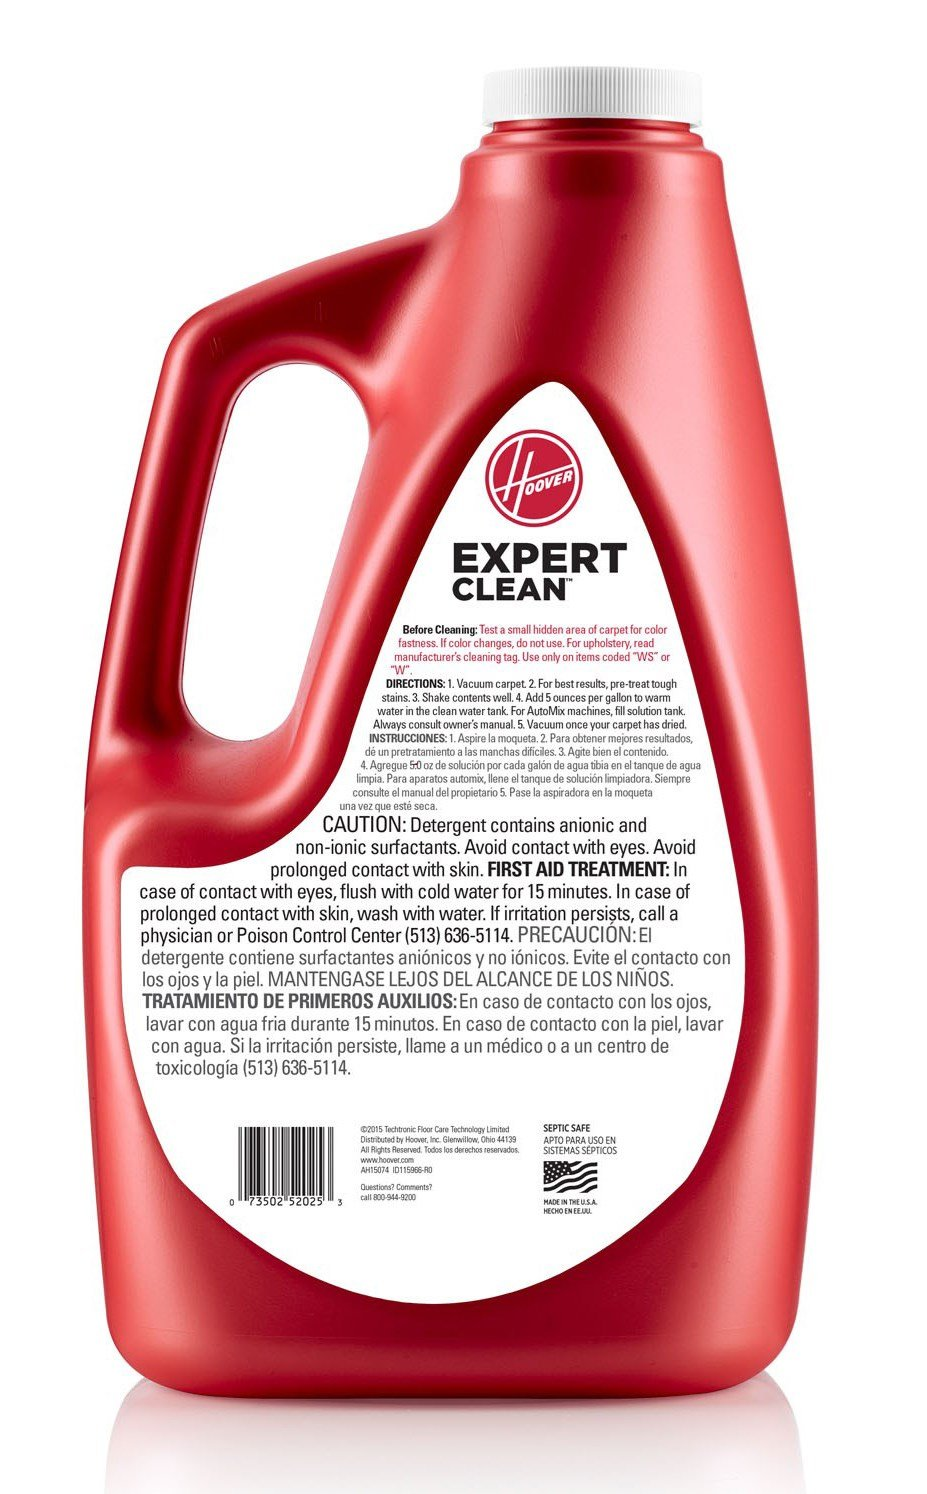 Detergent For Hoover Carpet Cleaner Floor Matttroy